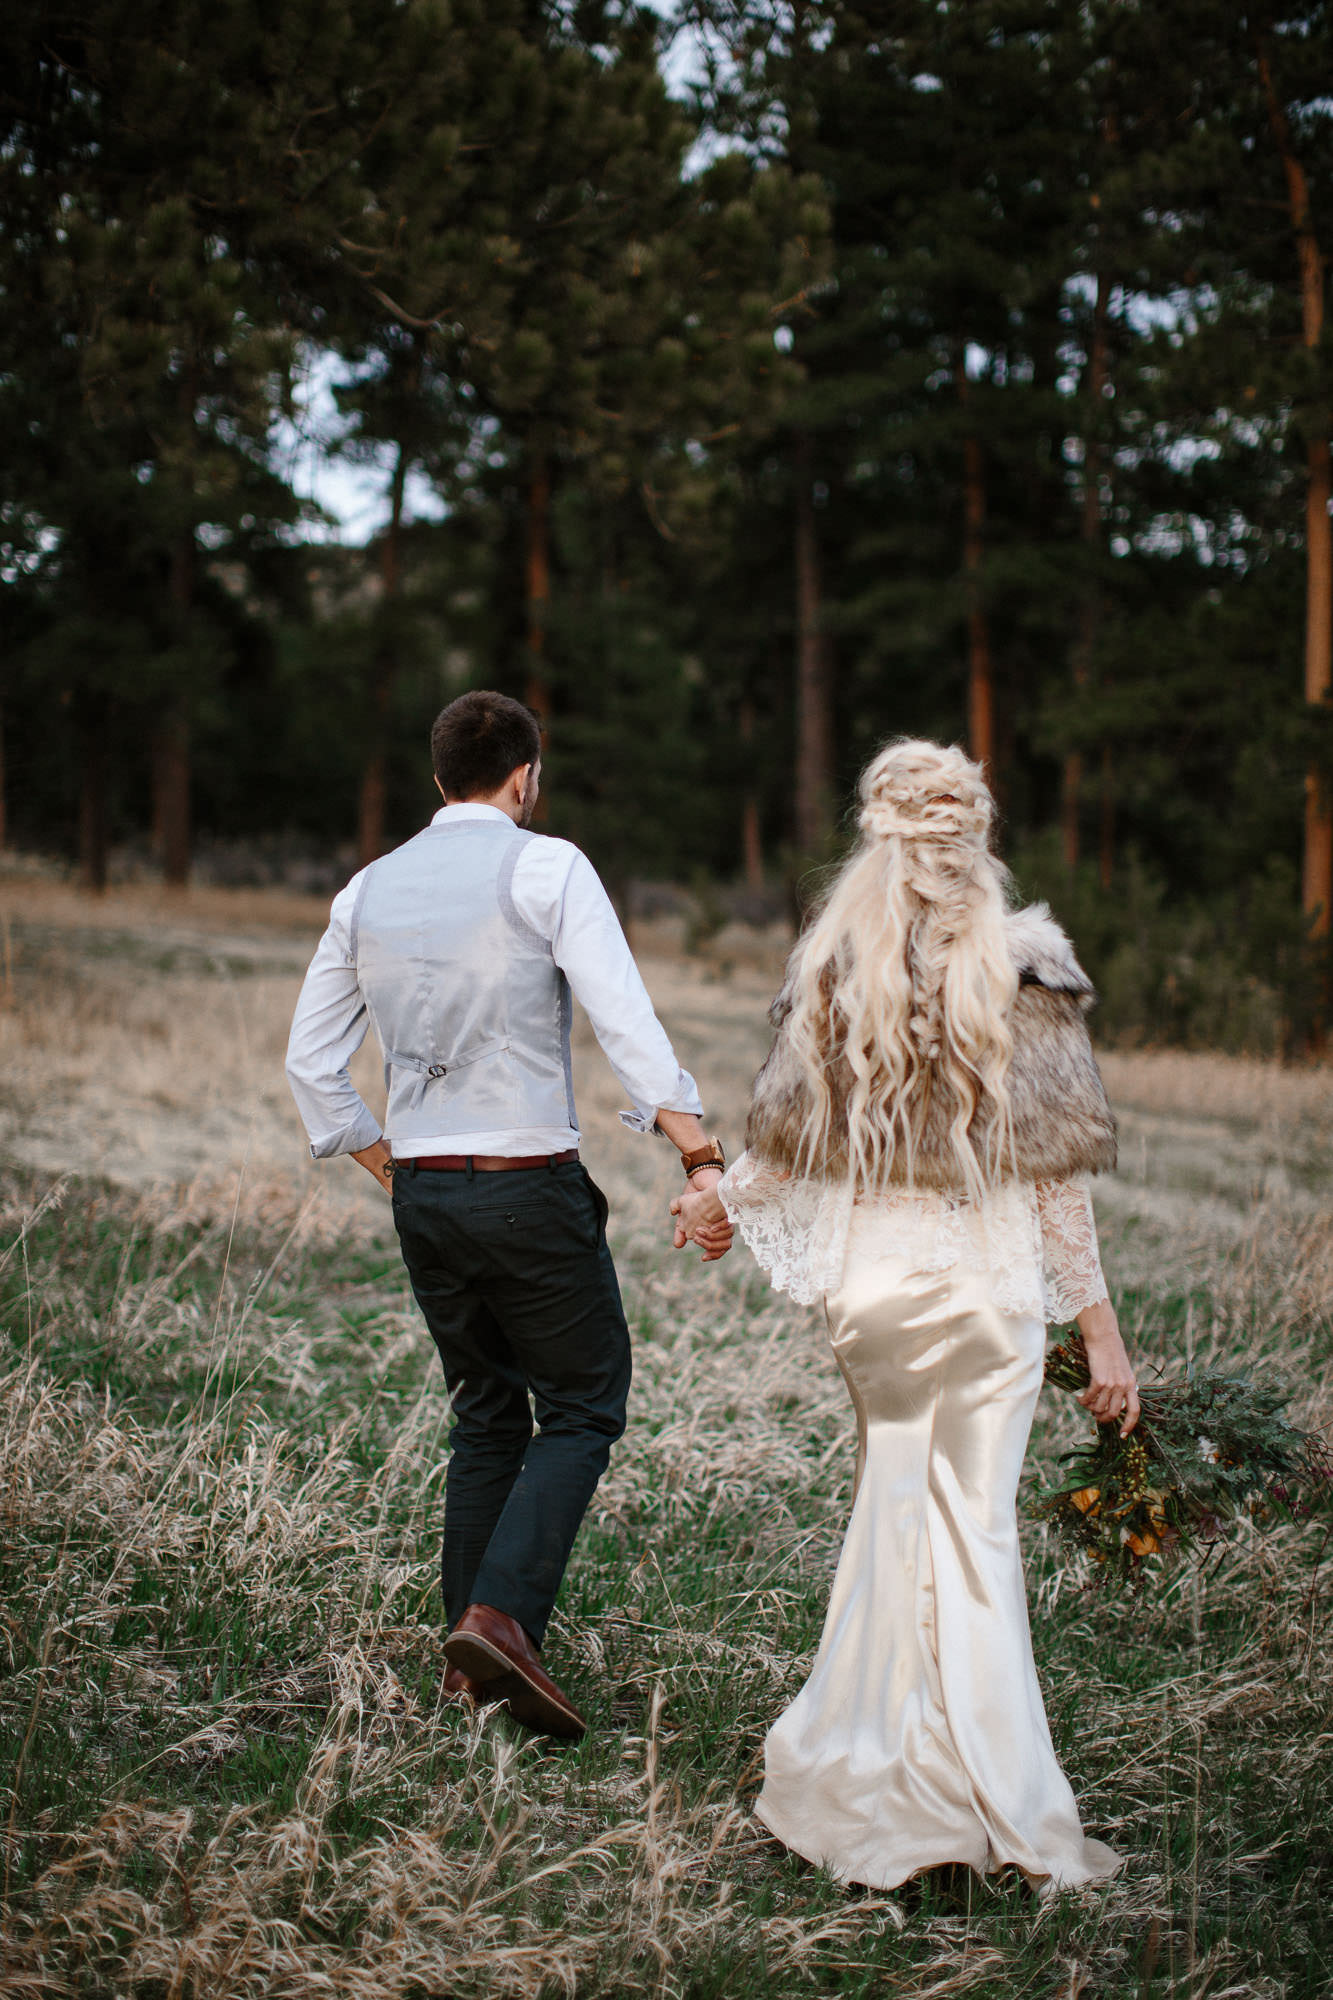 bucci-barn-wedding-elopement-evergreen-boulder-denver-colorado-adventerous-romantic-timeless-084.jpg